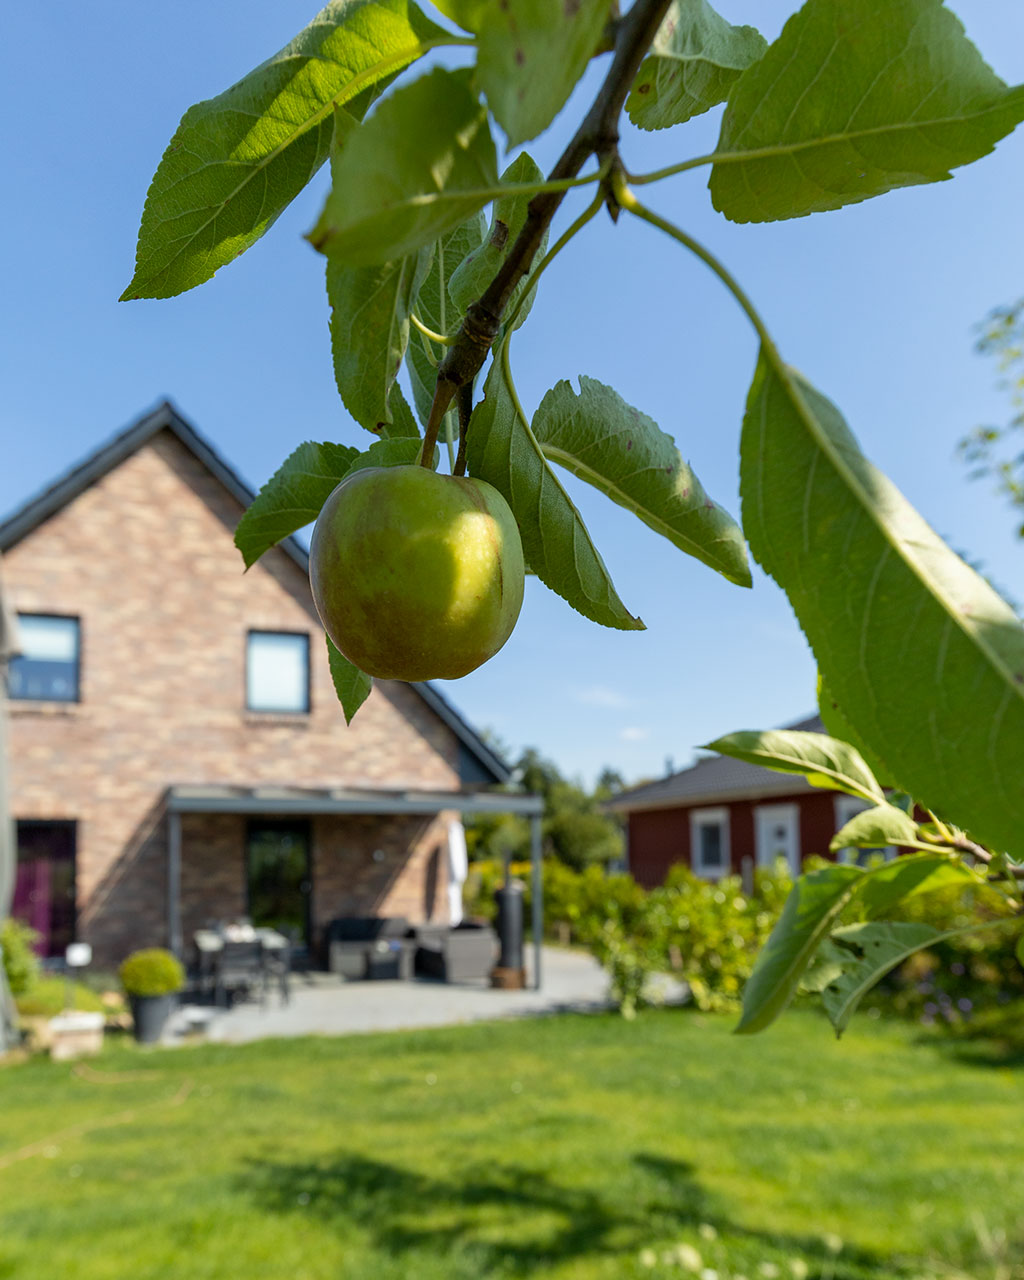 Apfel im eigenen Garten